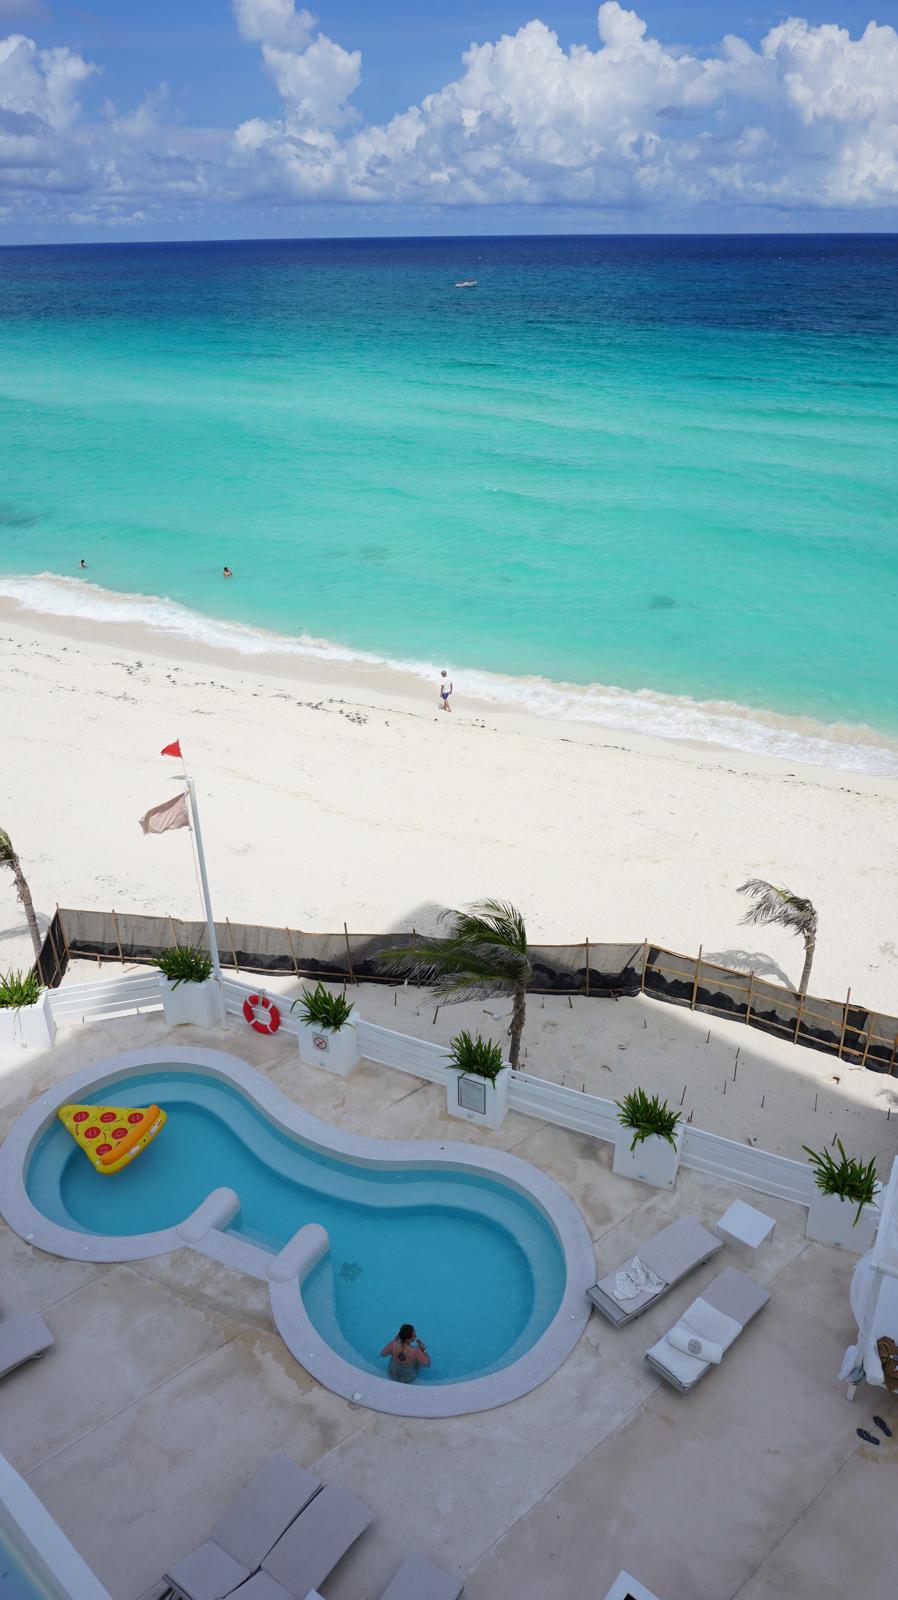 where-to-go-on-holiday-cancun-mexico-hotel-oleo-minas-planet-jamesgreen